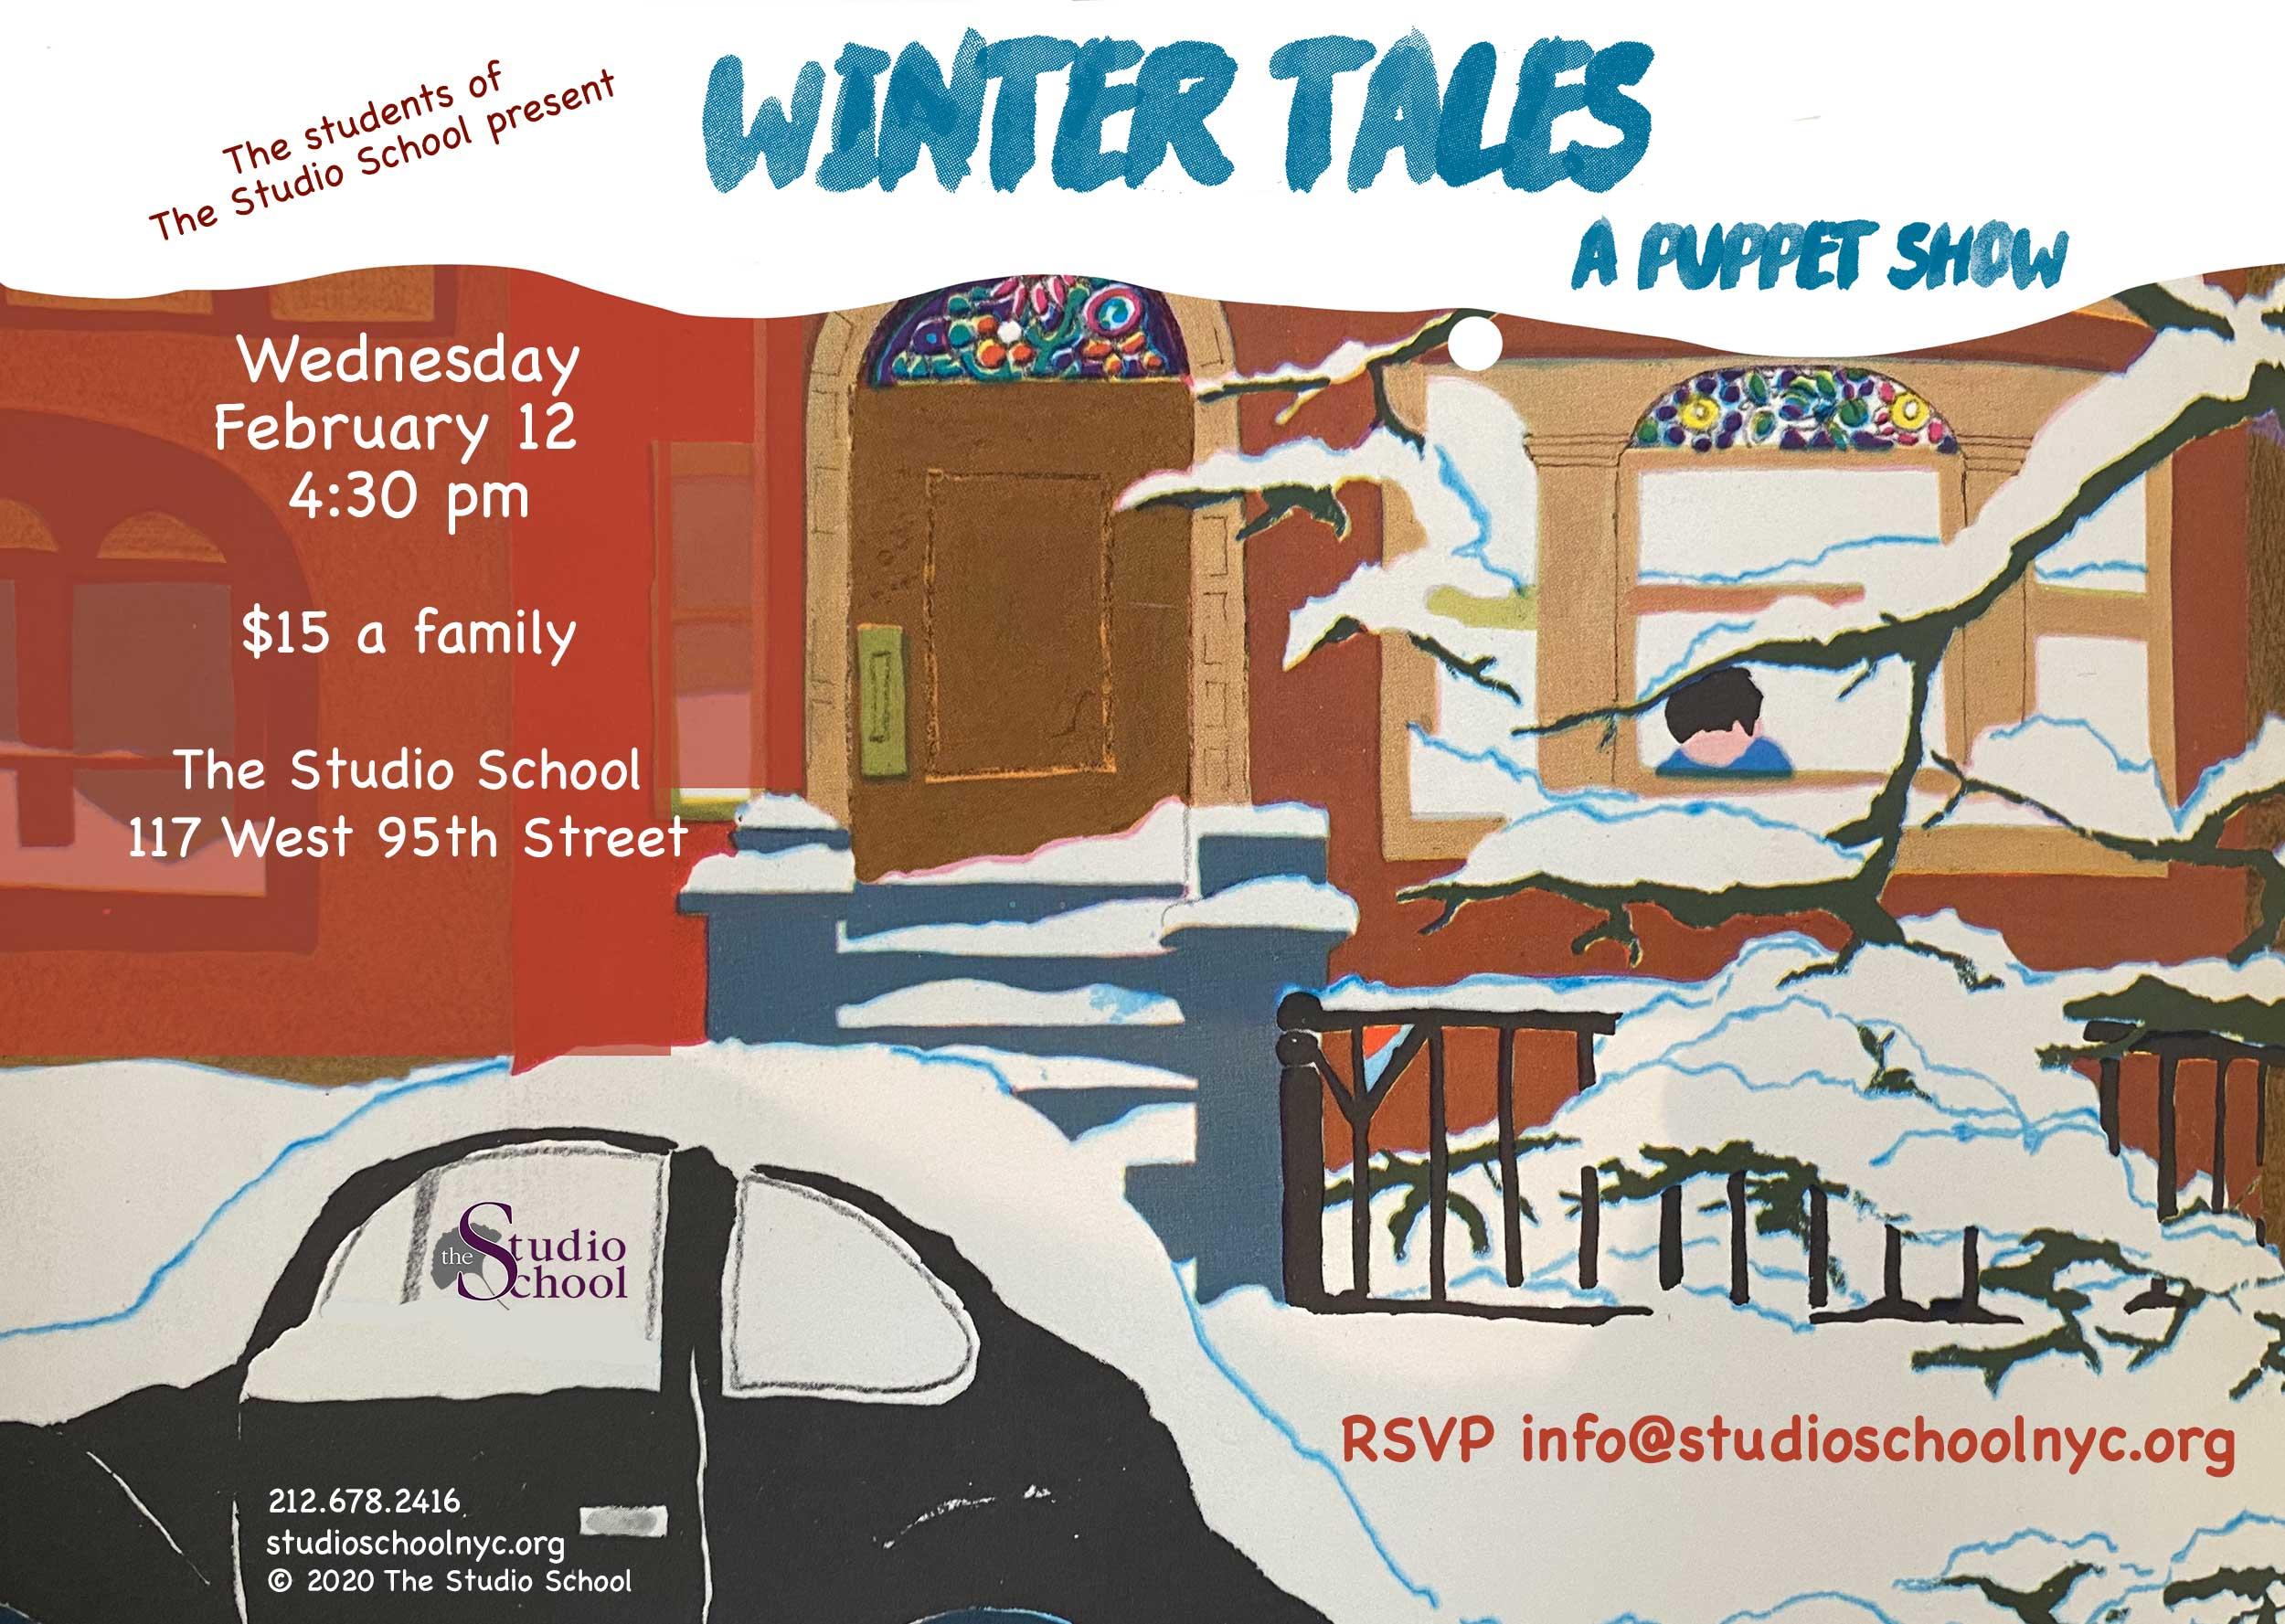 Winter Tales, A Puppet show